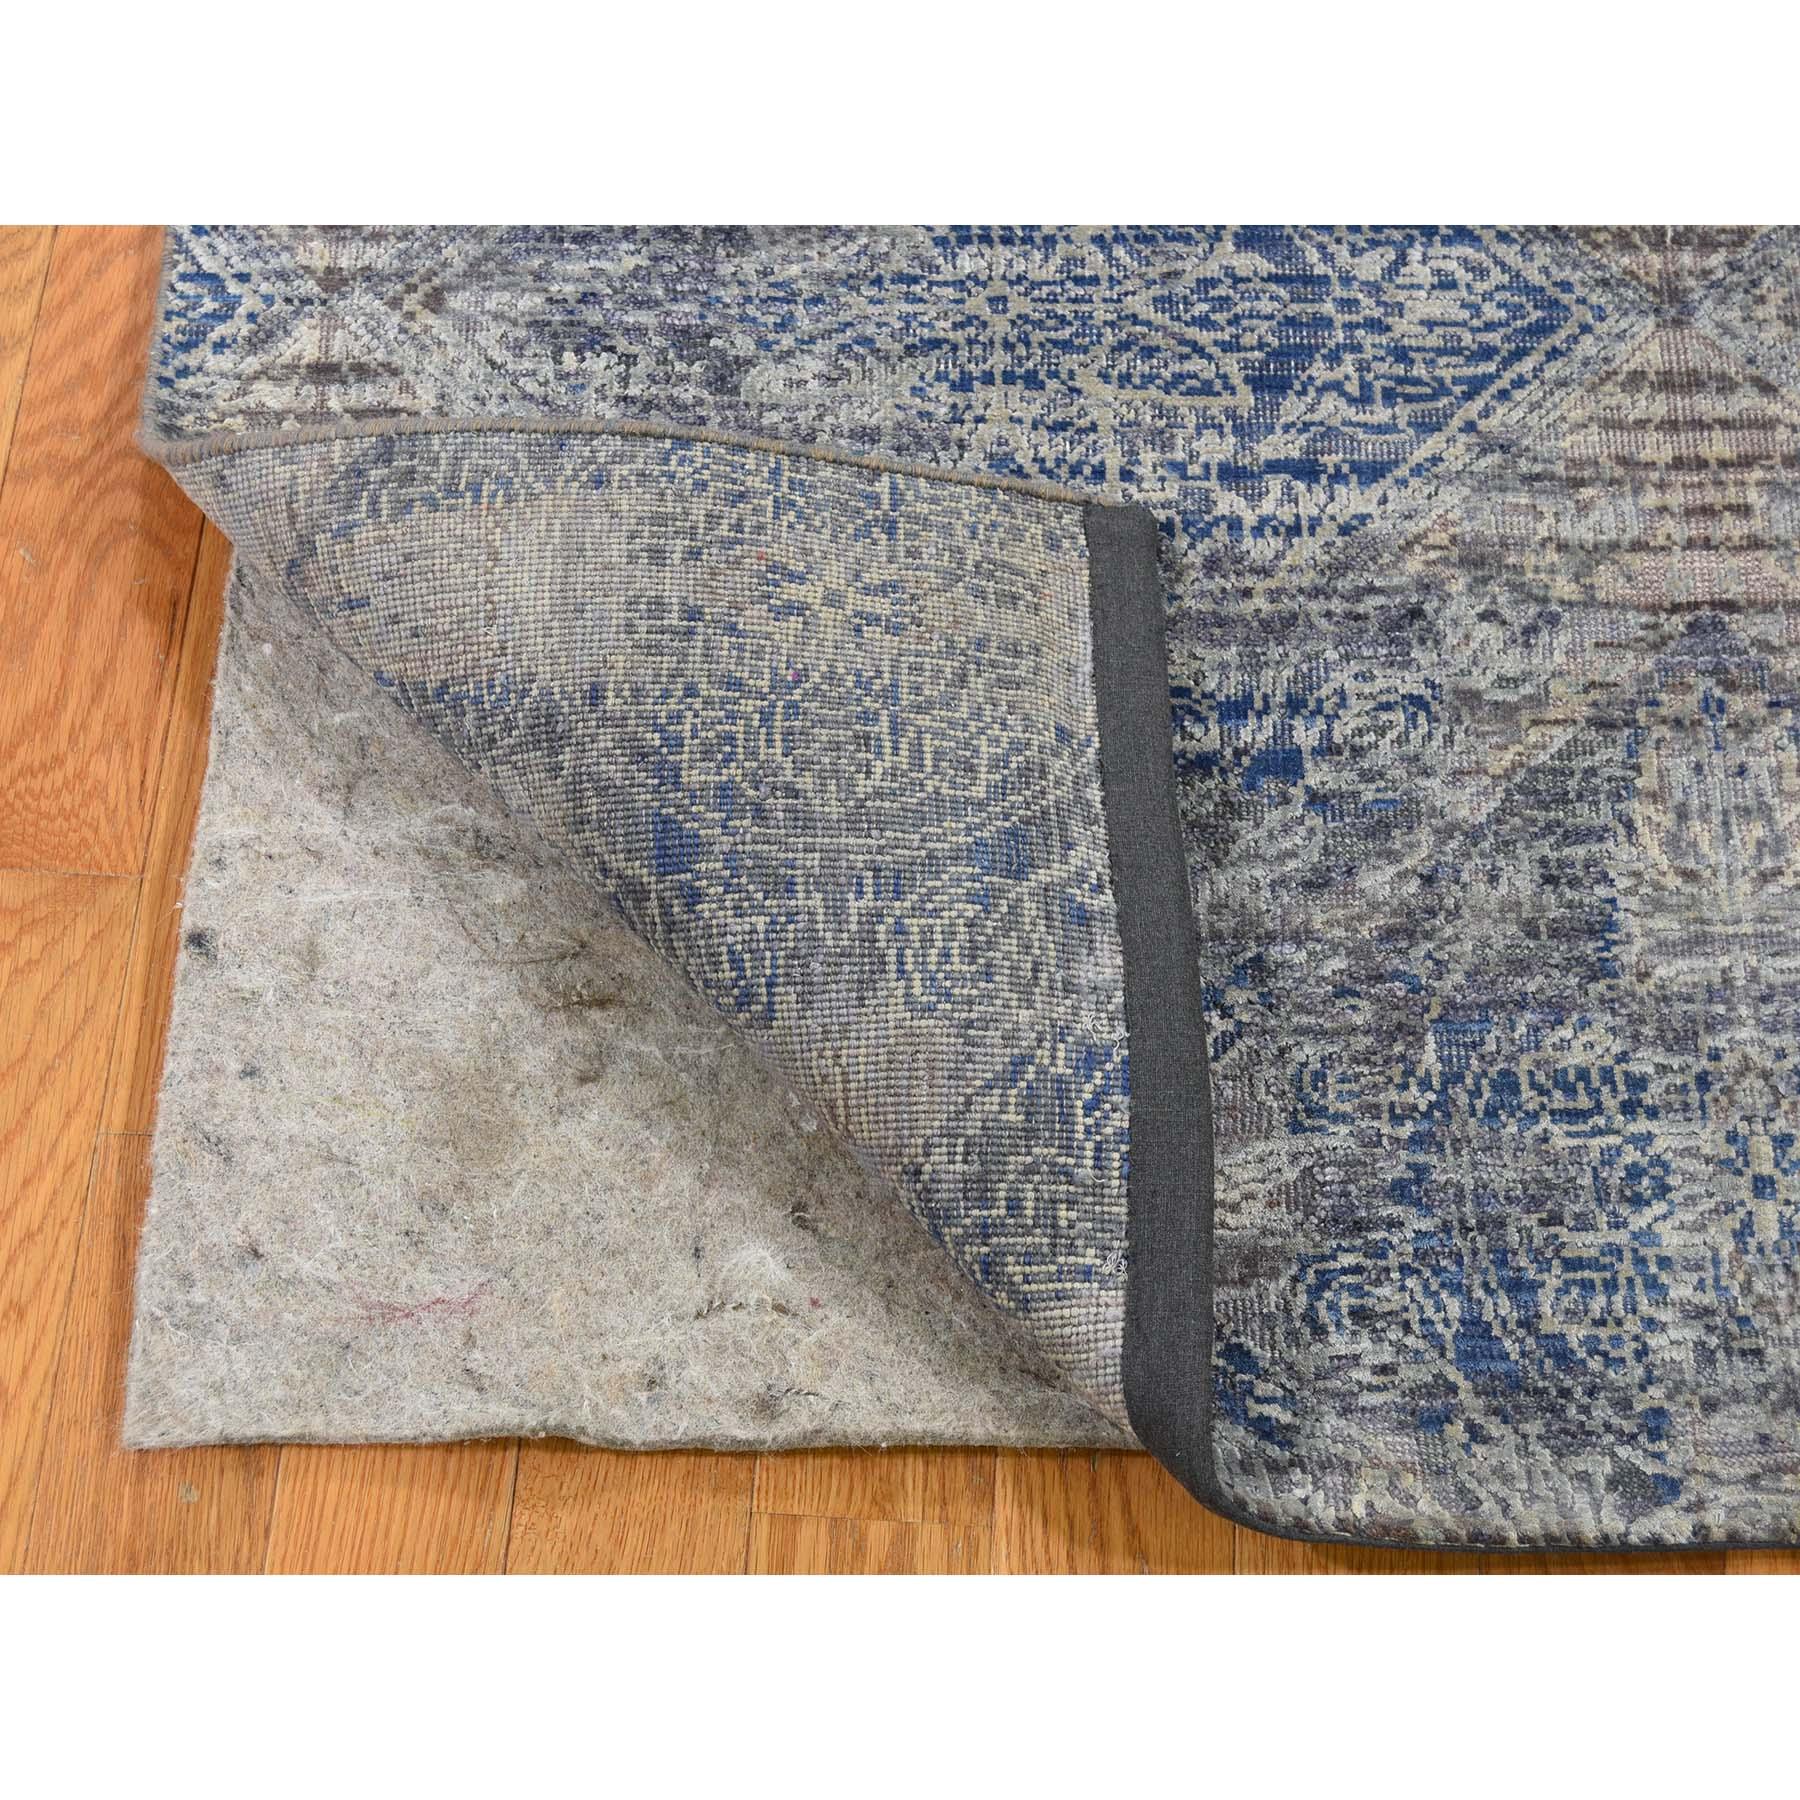 4-x6-2  Silk With Textured Wool Denim Blue Erased Rosette Design Hand-Knotted Oriental Rug